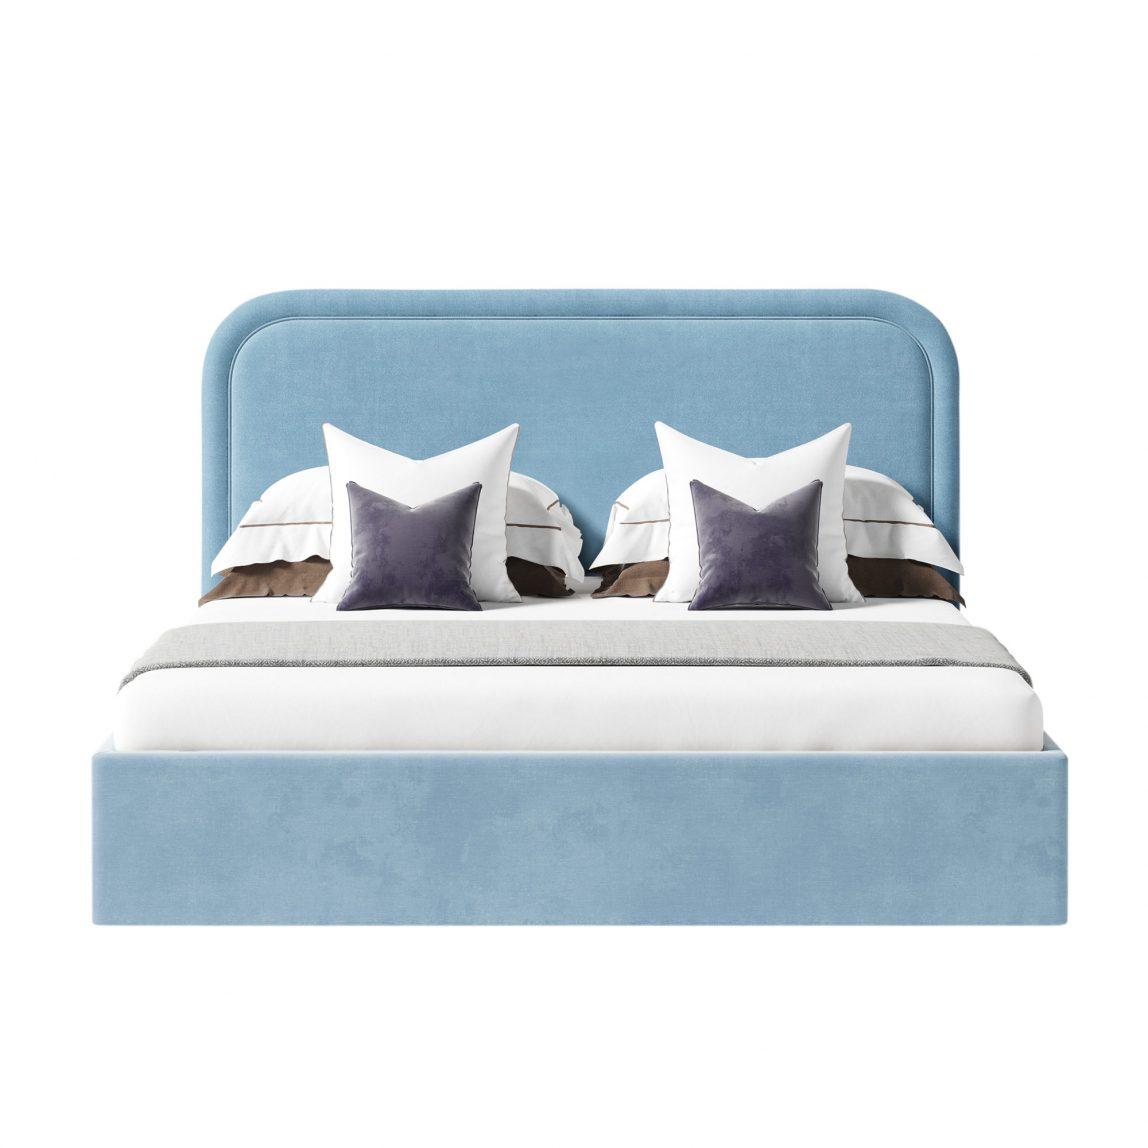 Мягкая кровать Лукас